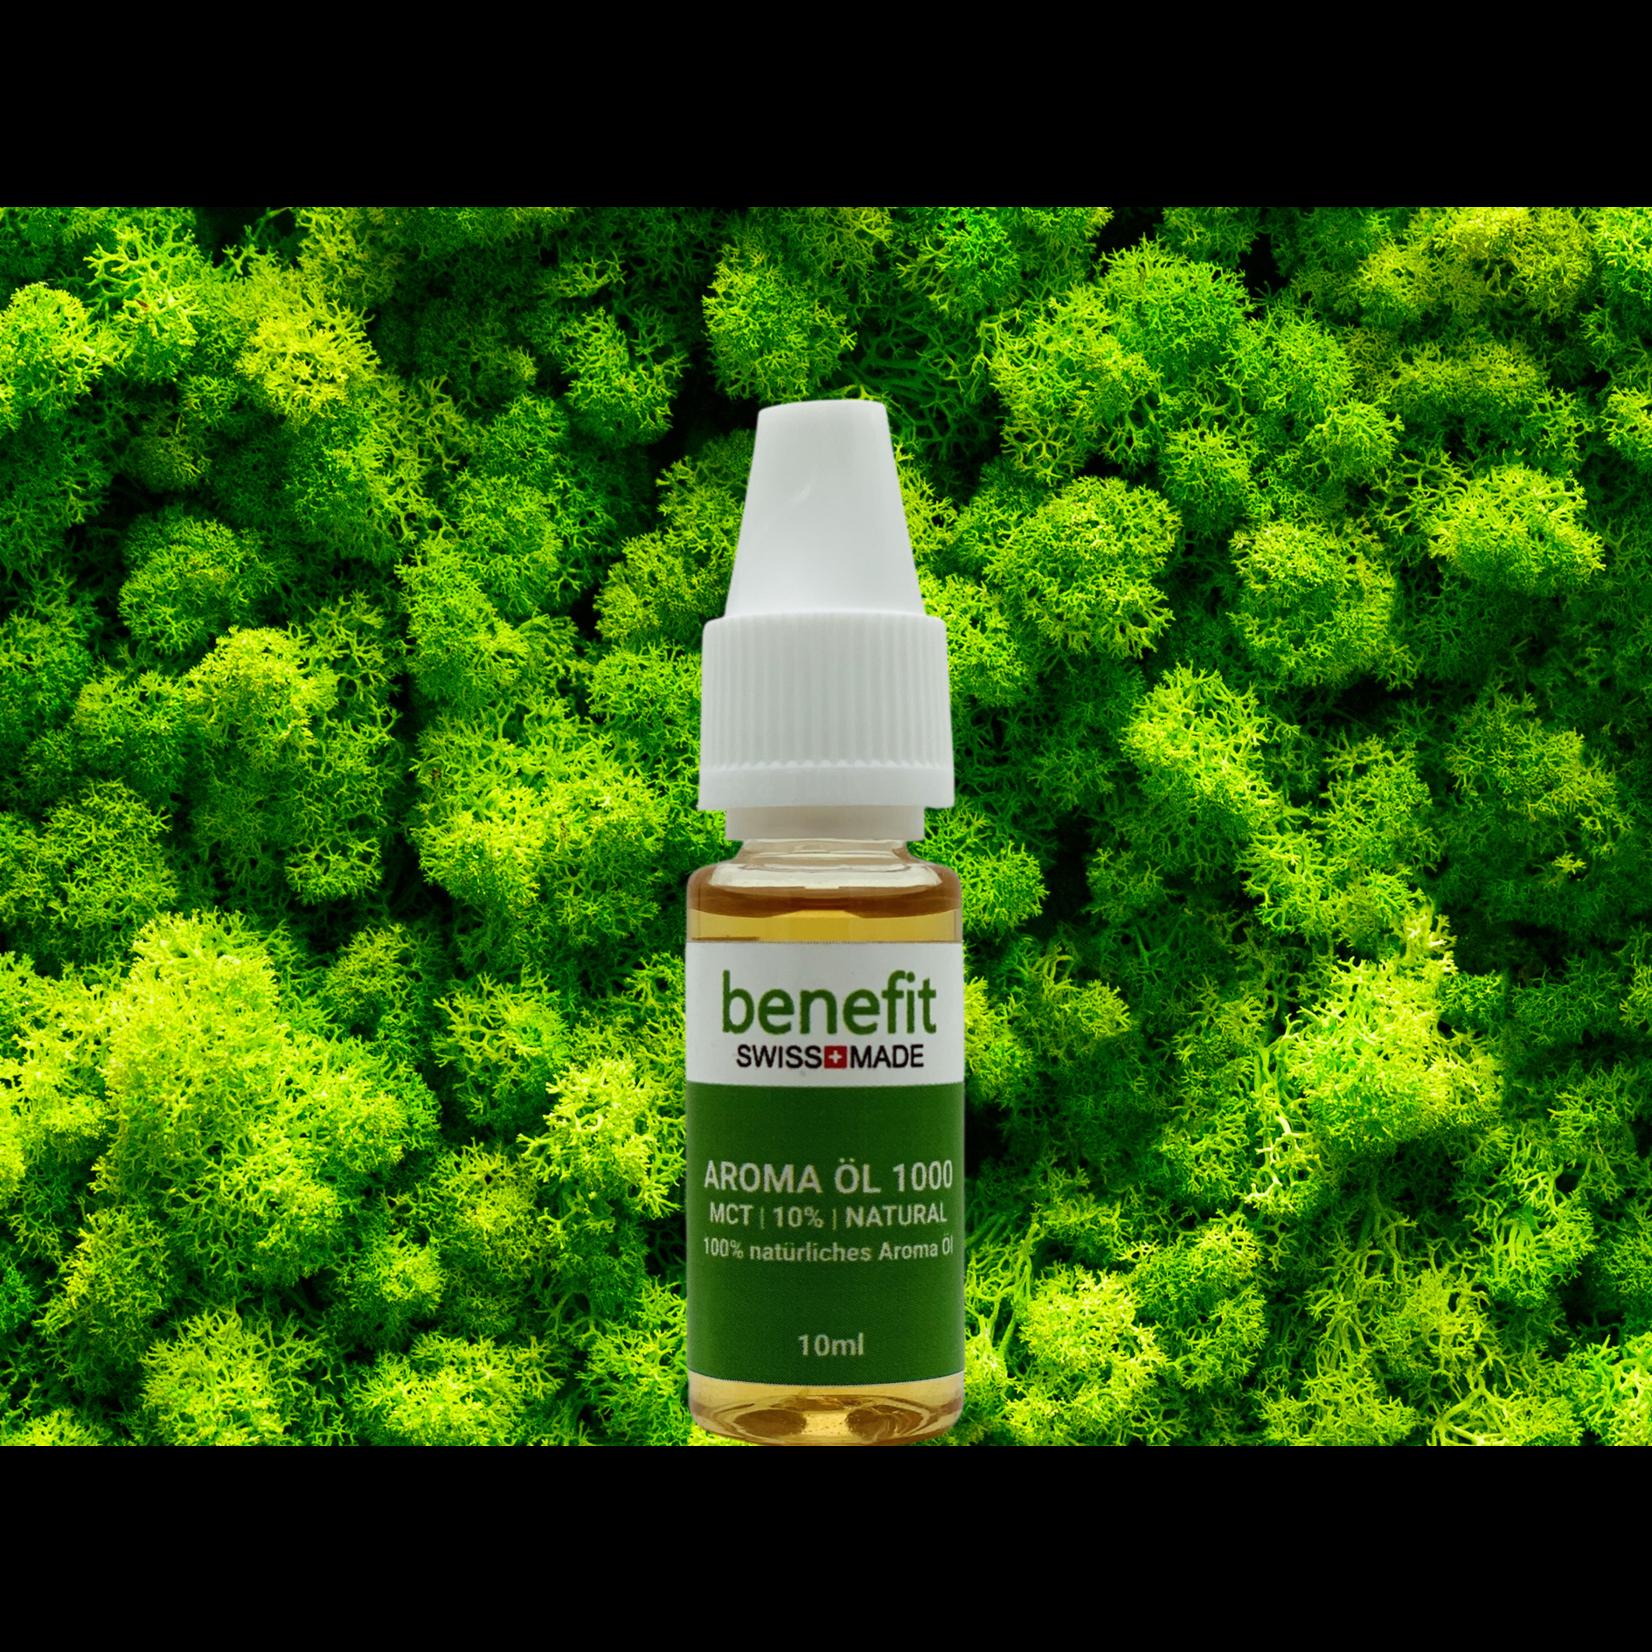 benefit CBD benefit Aroma Öl Kreation